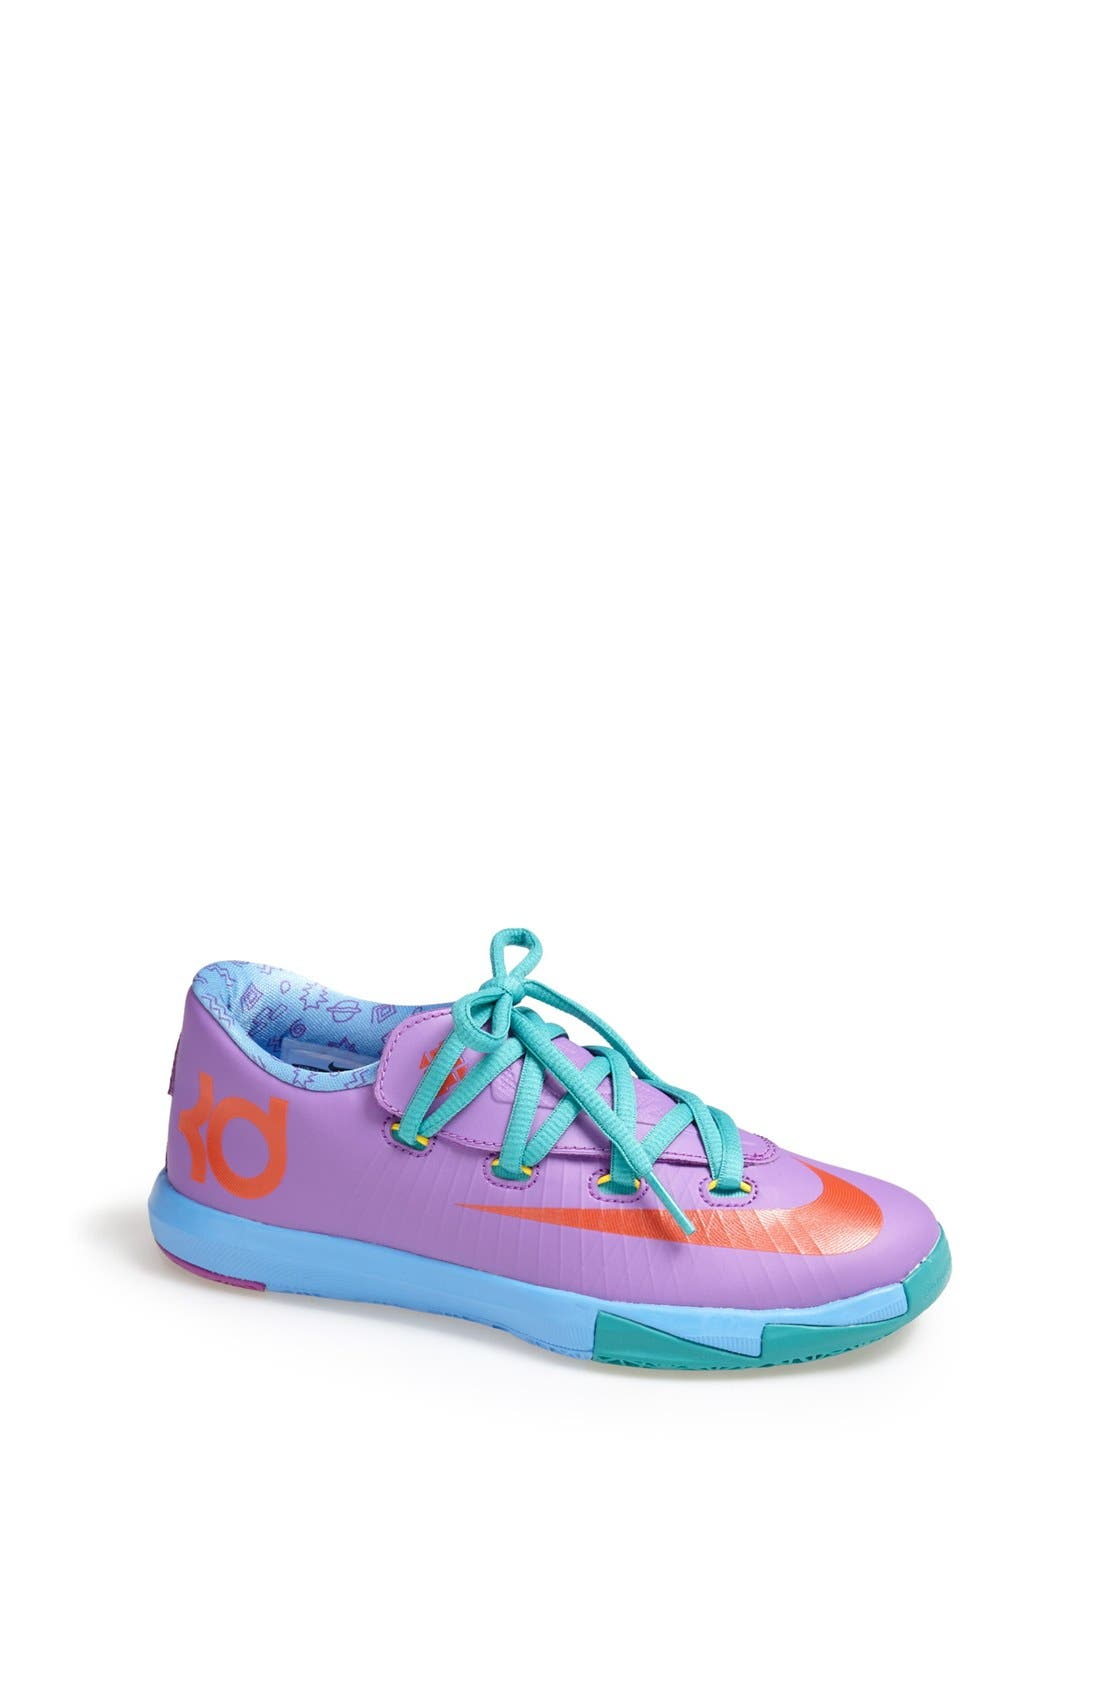 Main Image - Nike 'KD VI' Basketball Shoe (Walker, Toddler & Little Kid)